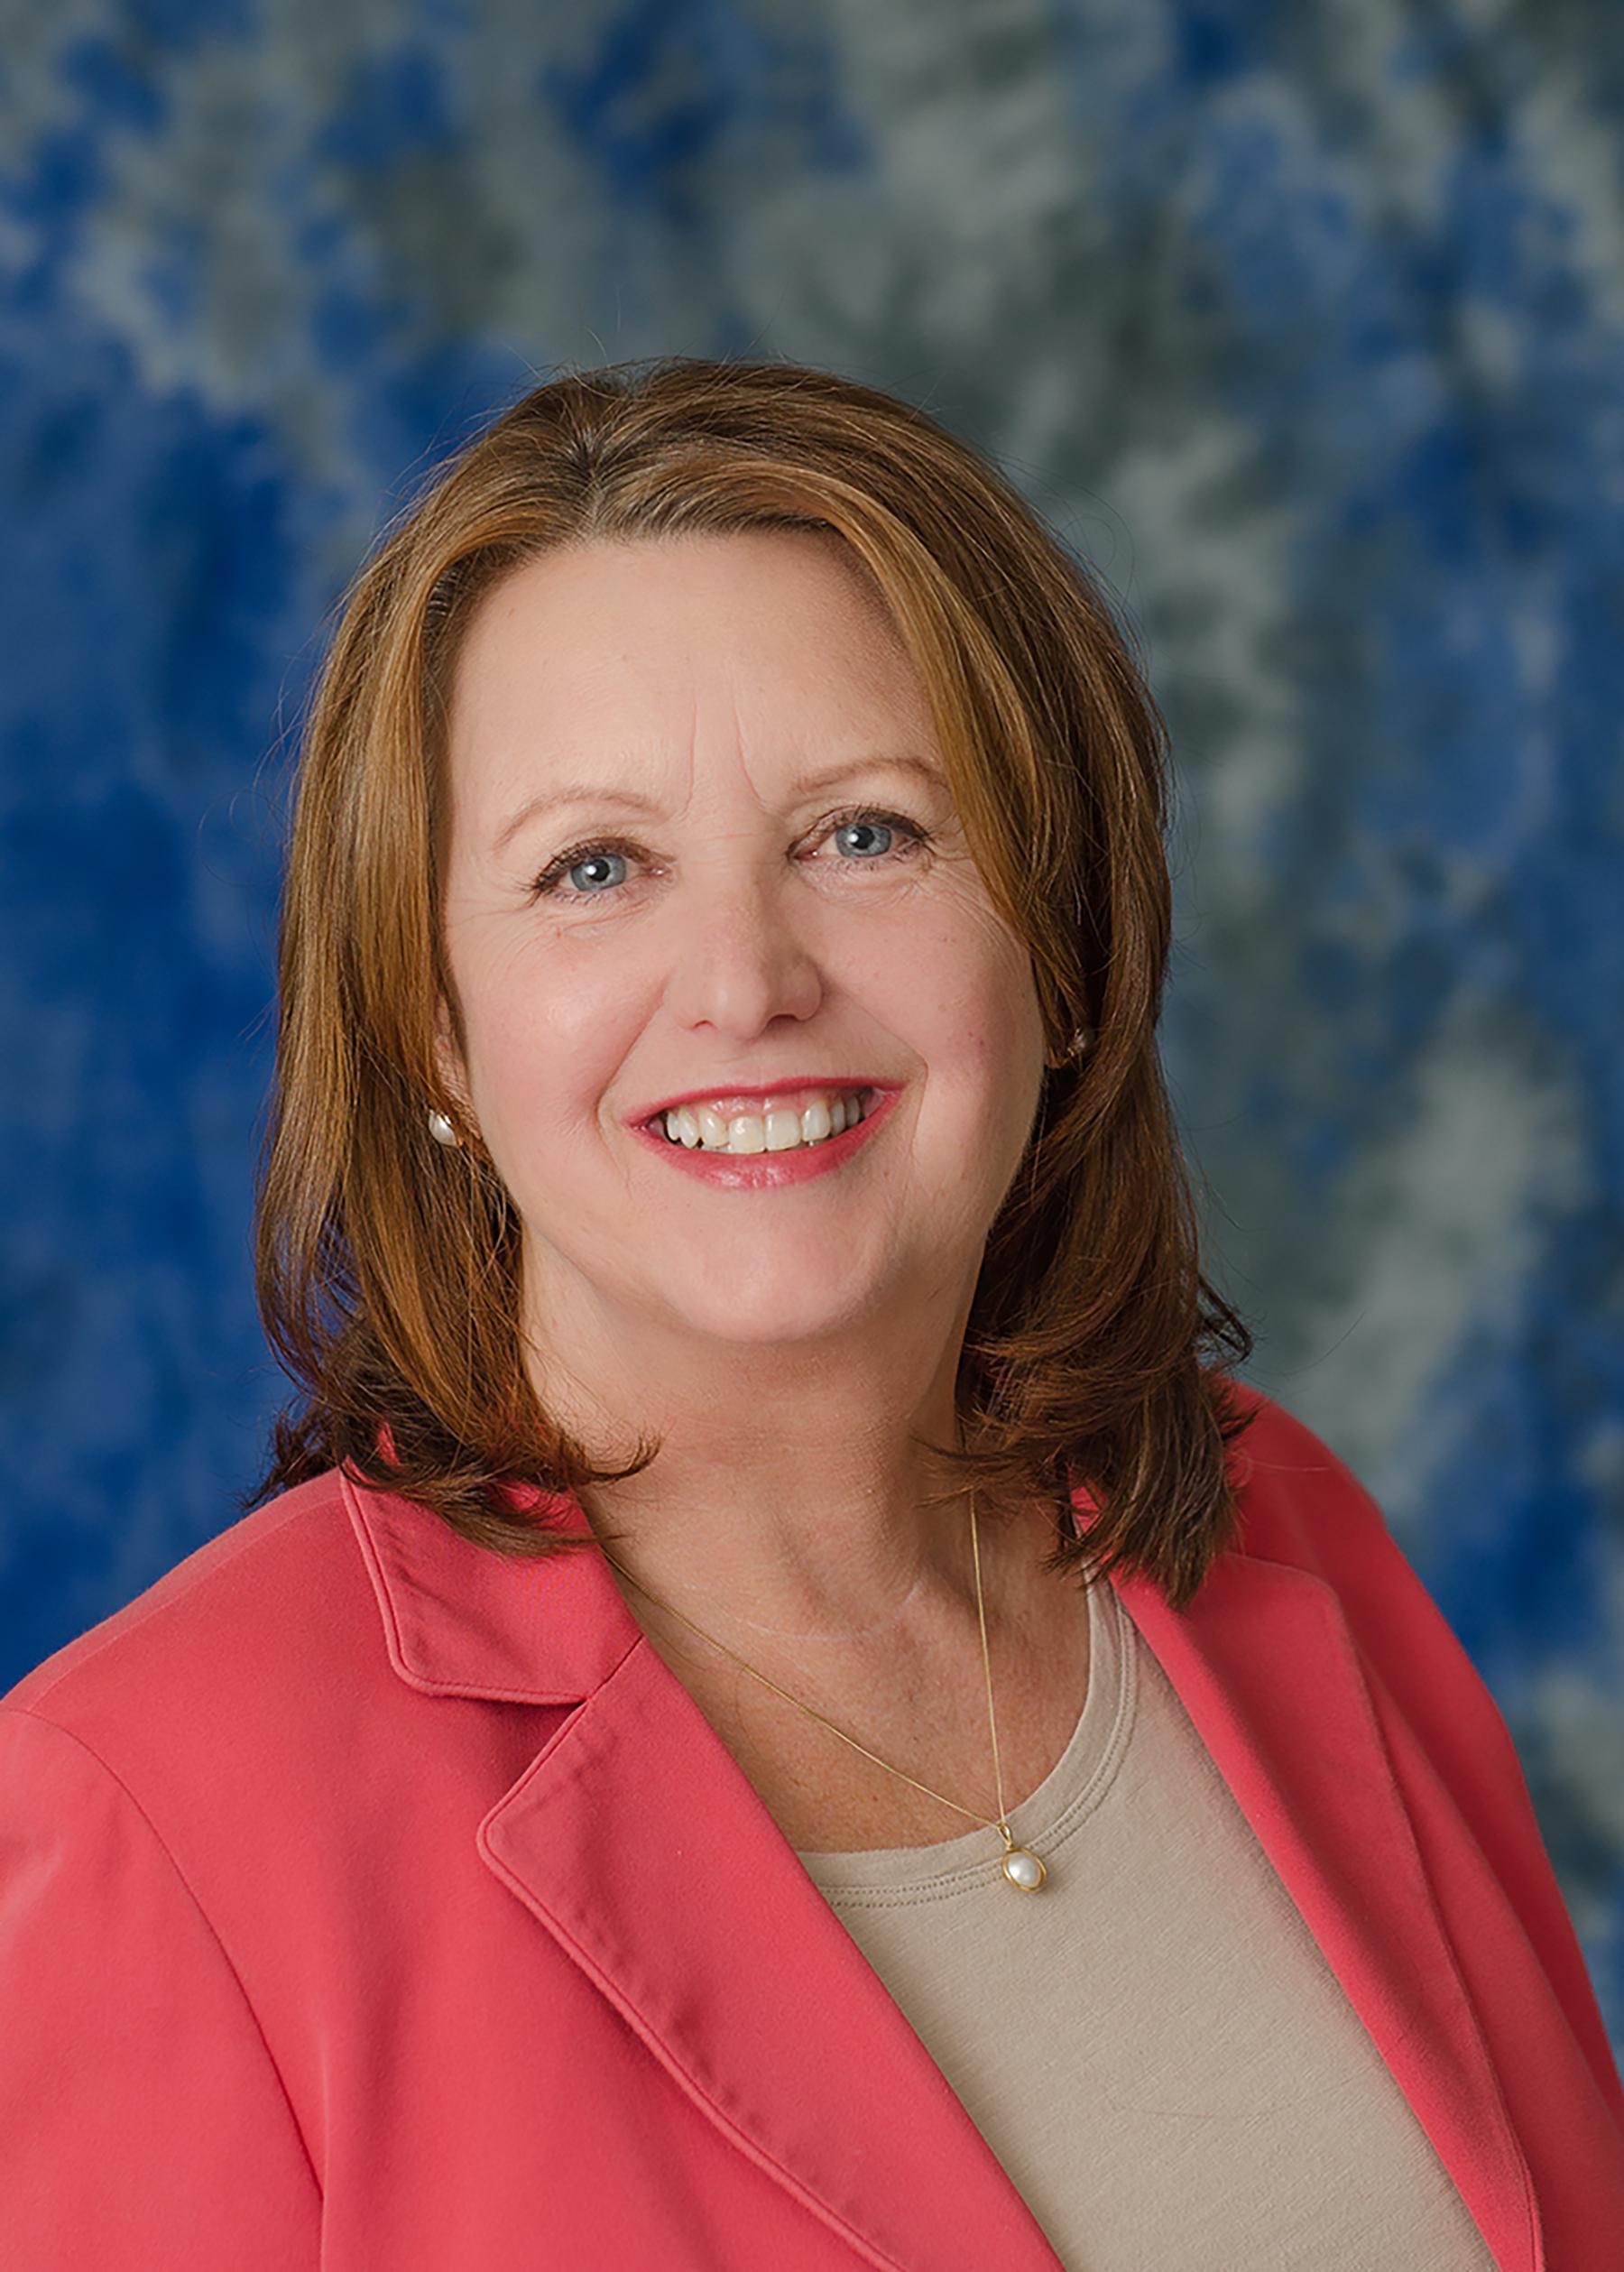 Kennesaw GA female executive headshot